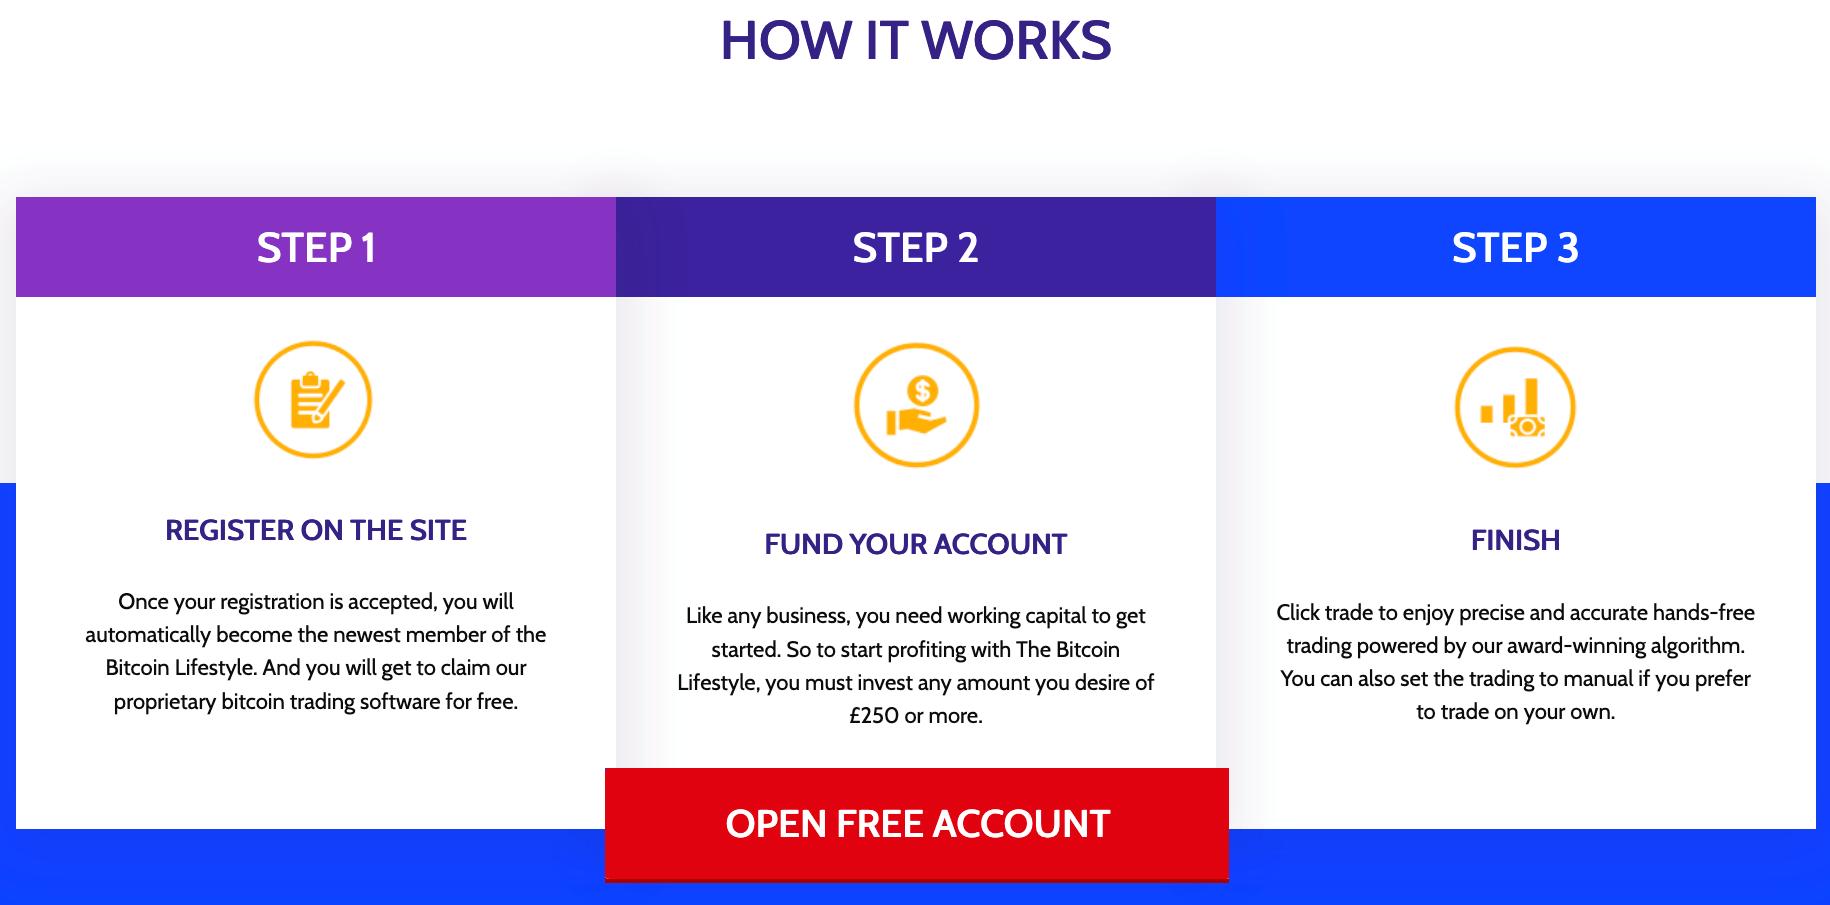 Bitcoin Lifestyle Platform